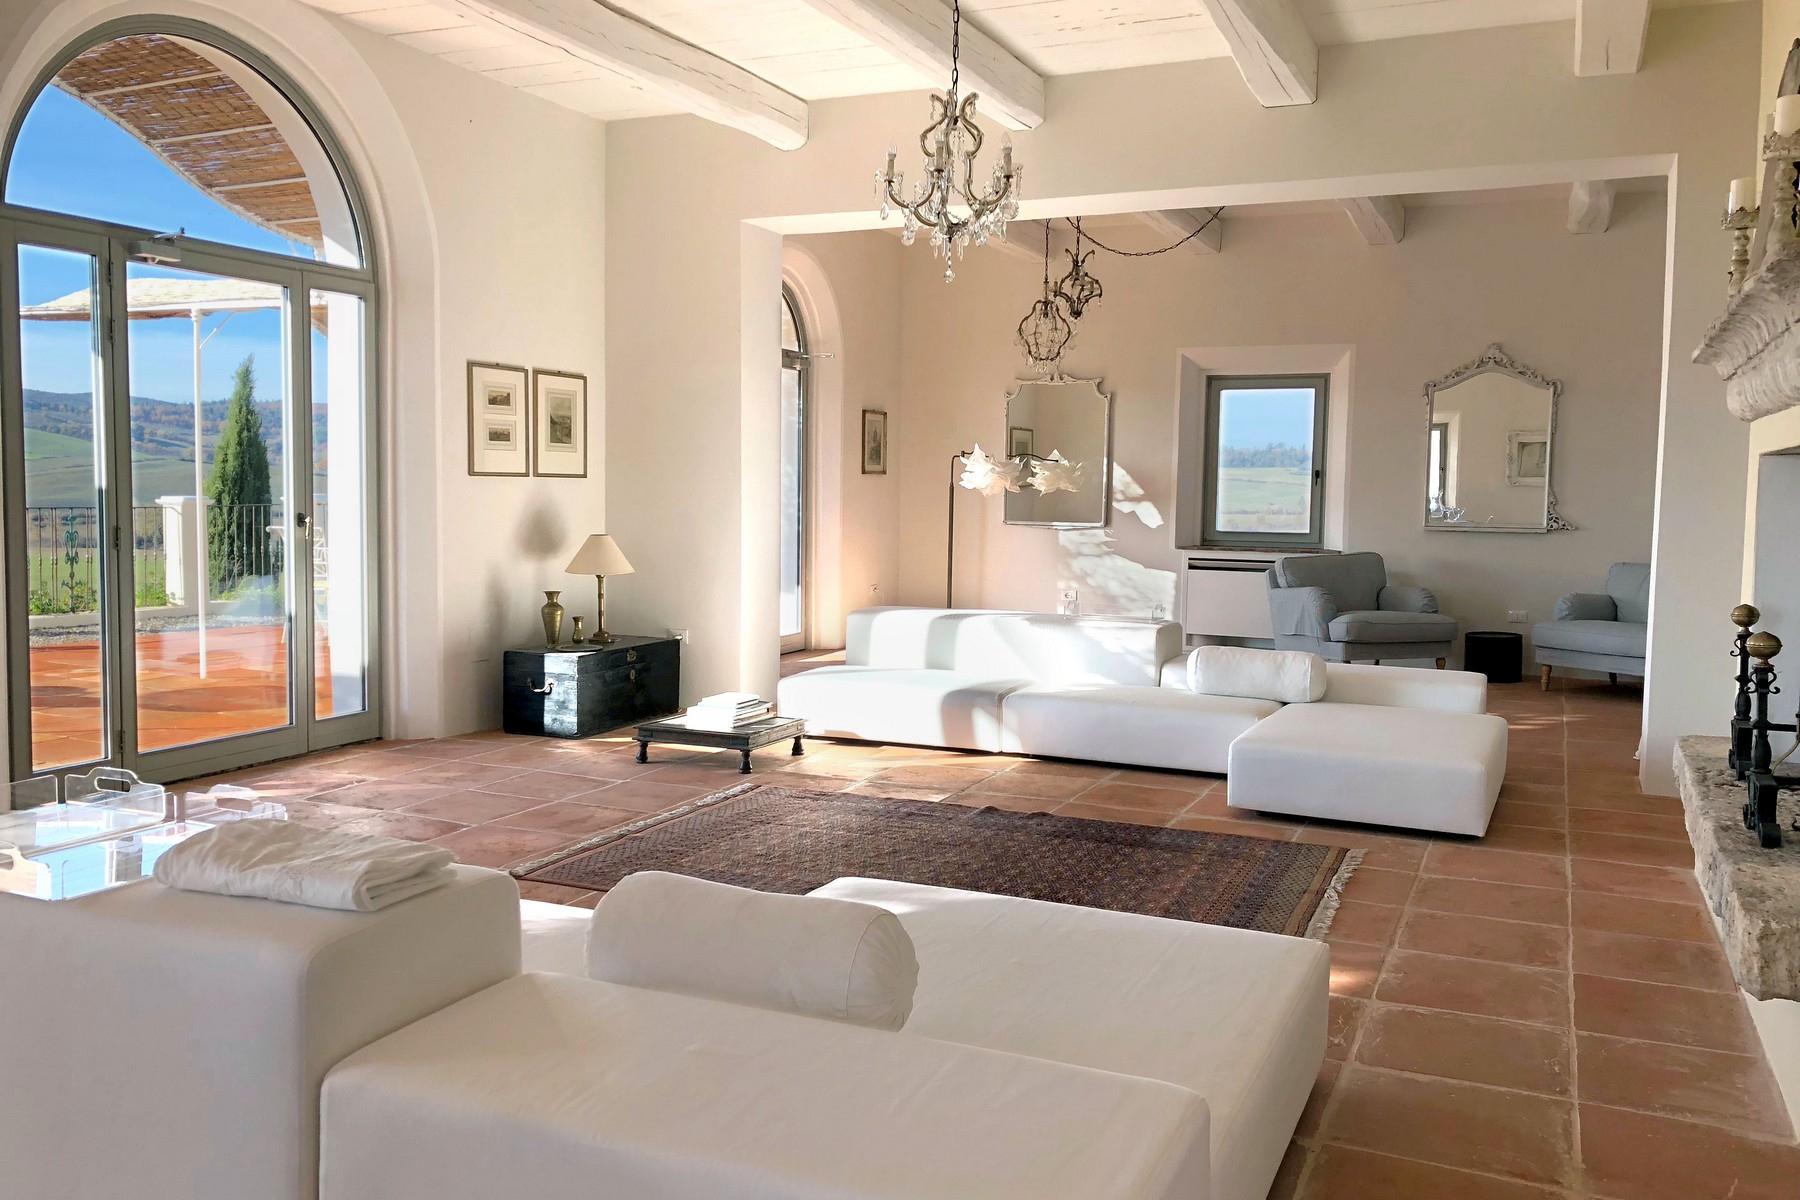 Elegant 13th century country villa - 6